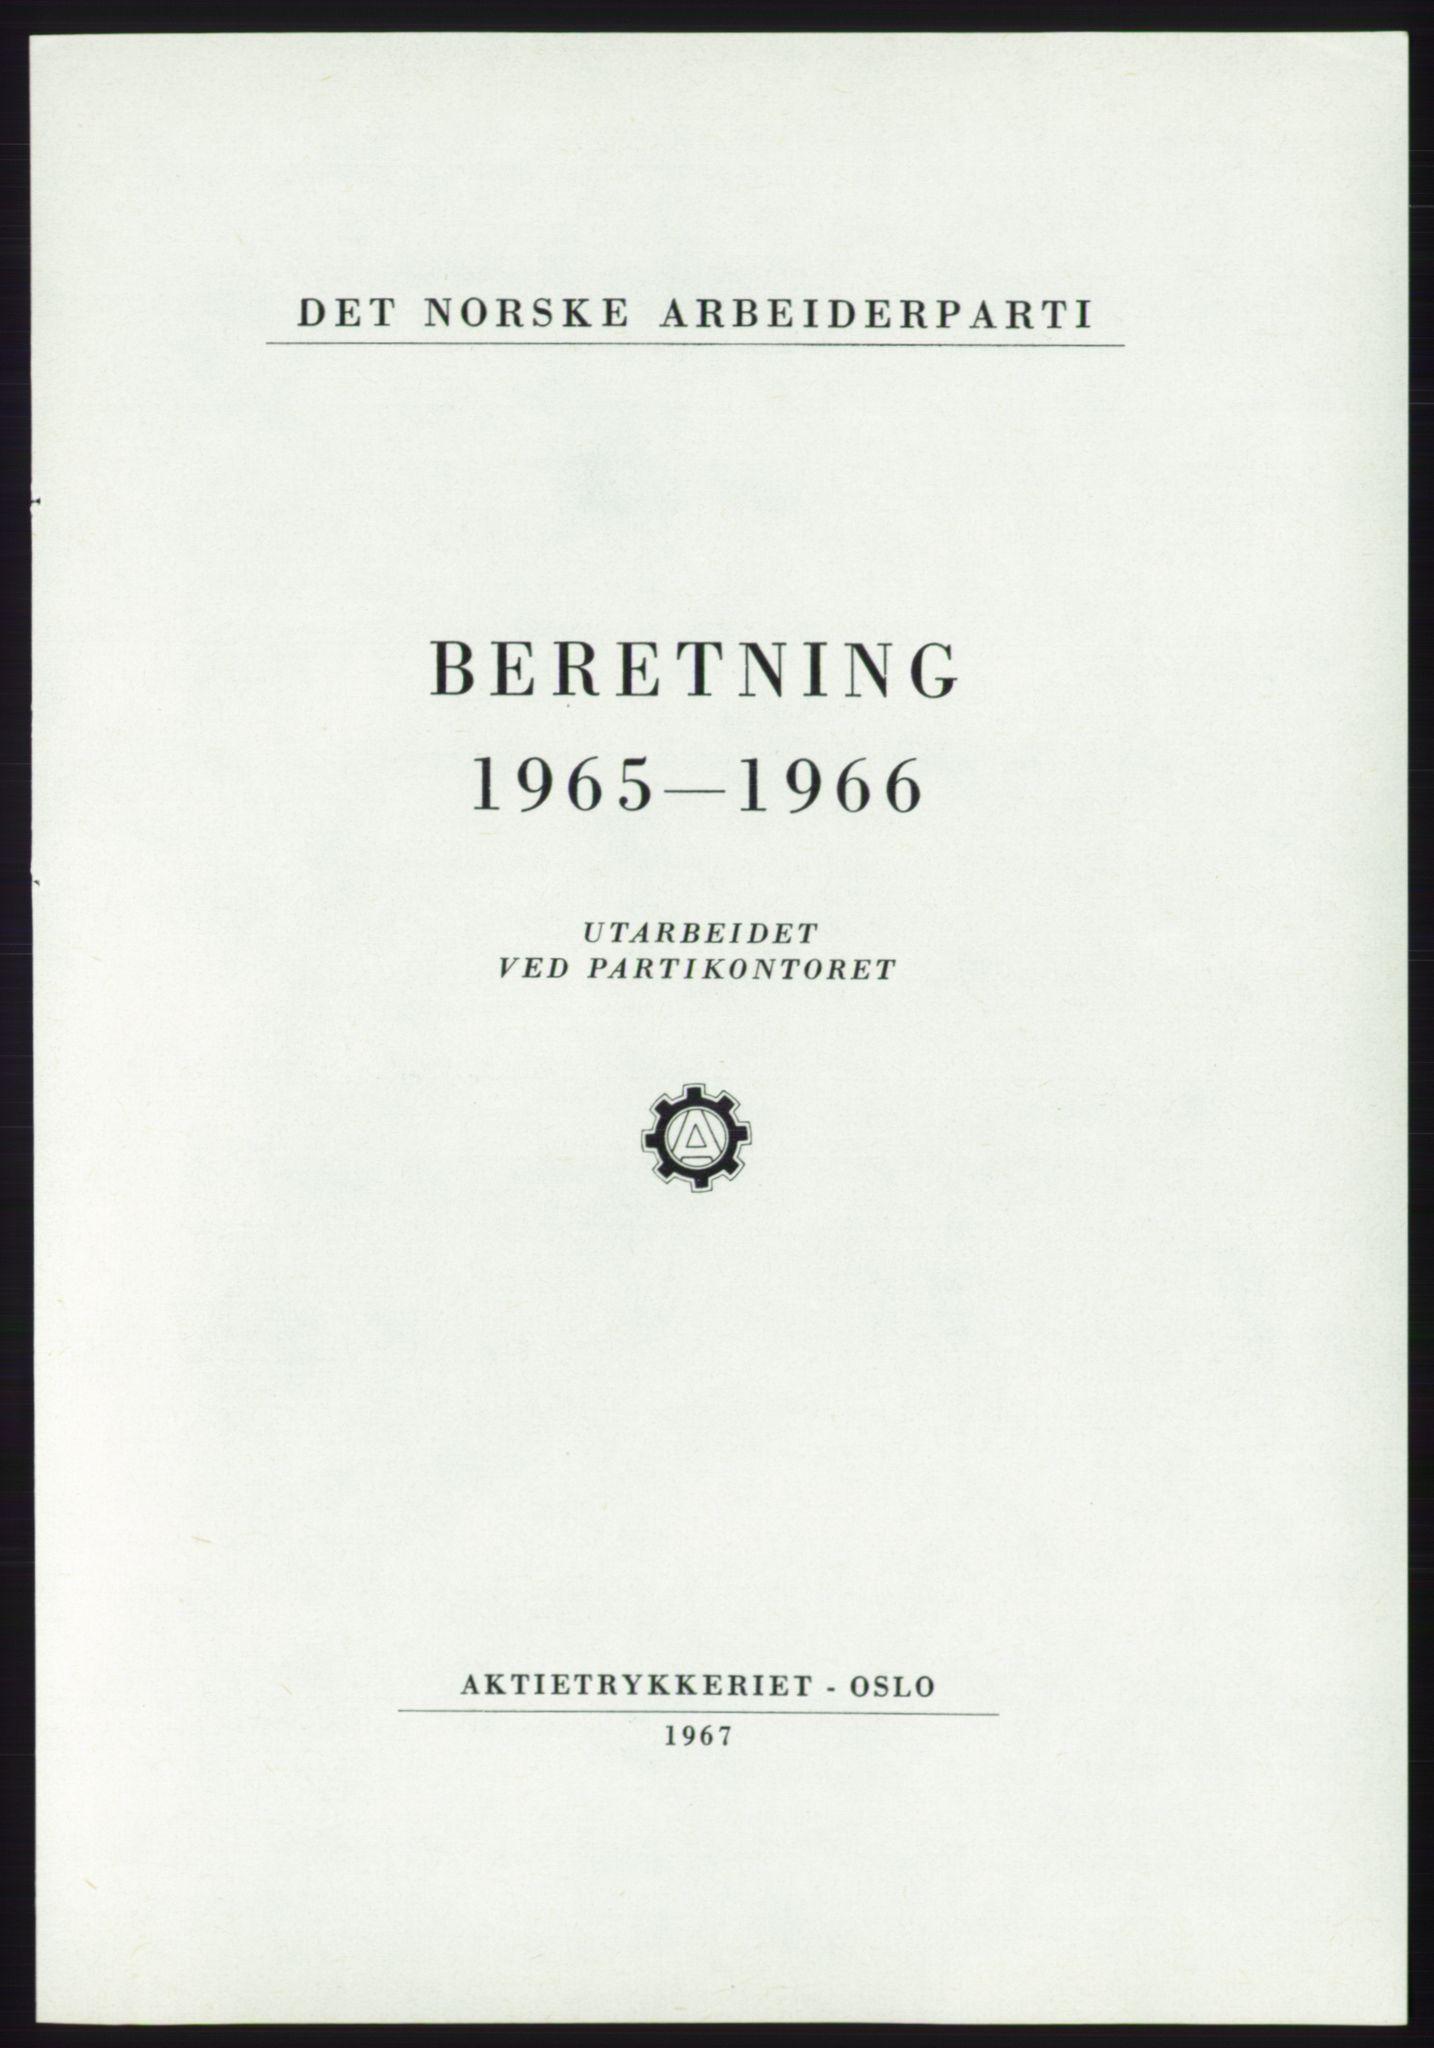 AAB, Det norske Arbeiderparti - publikasjoner, -/-: Beretning 1965-1966, 1965-1966